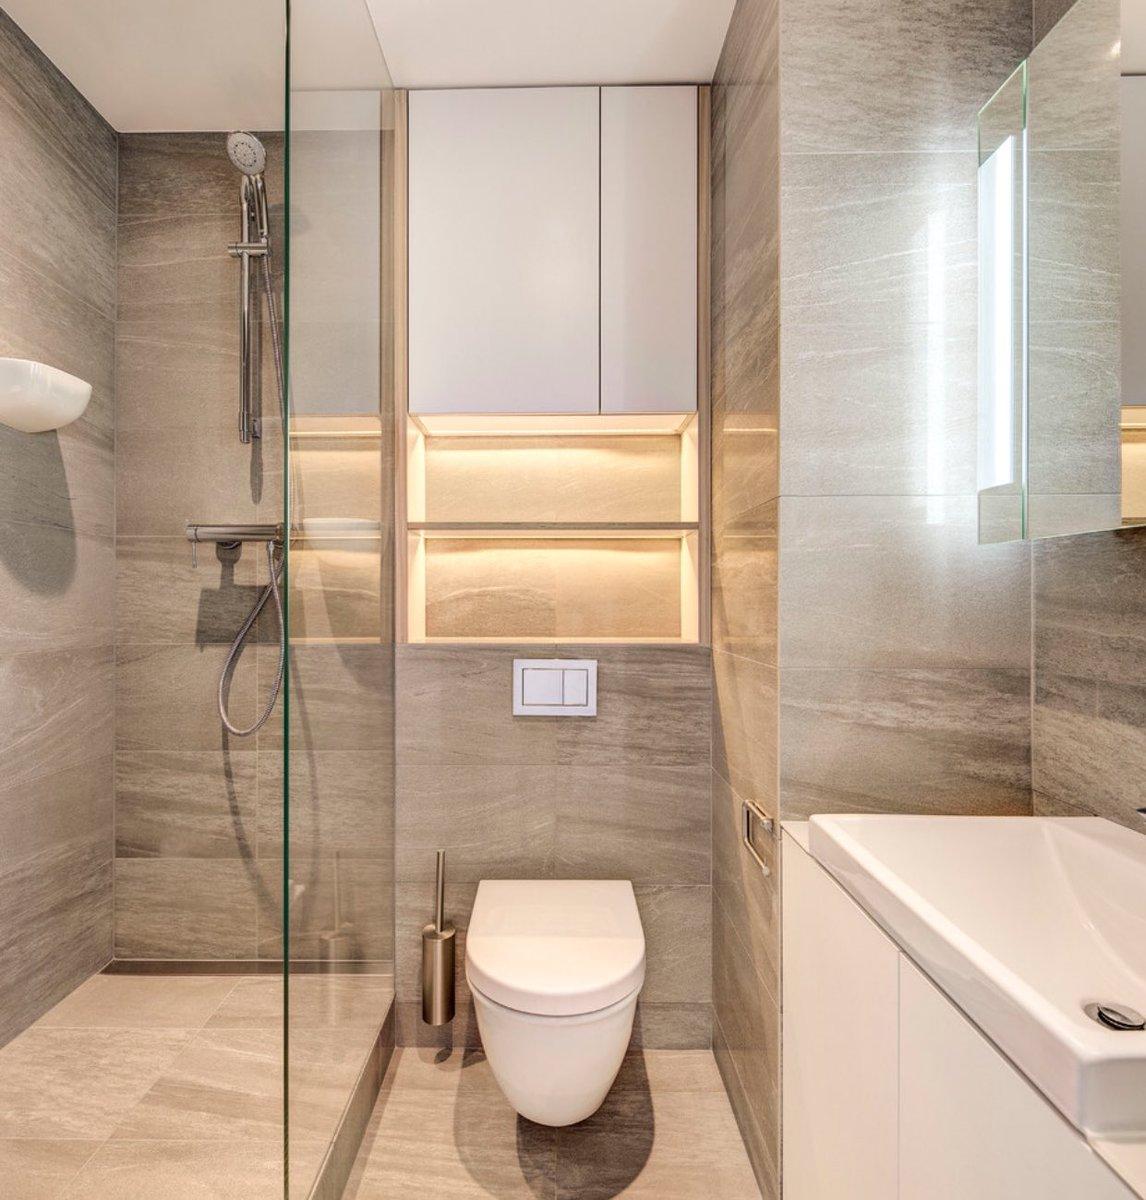 بالصور ديكور حمامات صغيرة , اجمل ديكورات الحمامات 6237 3